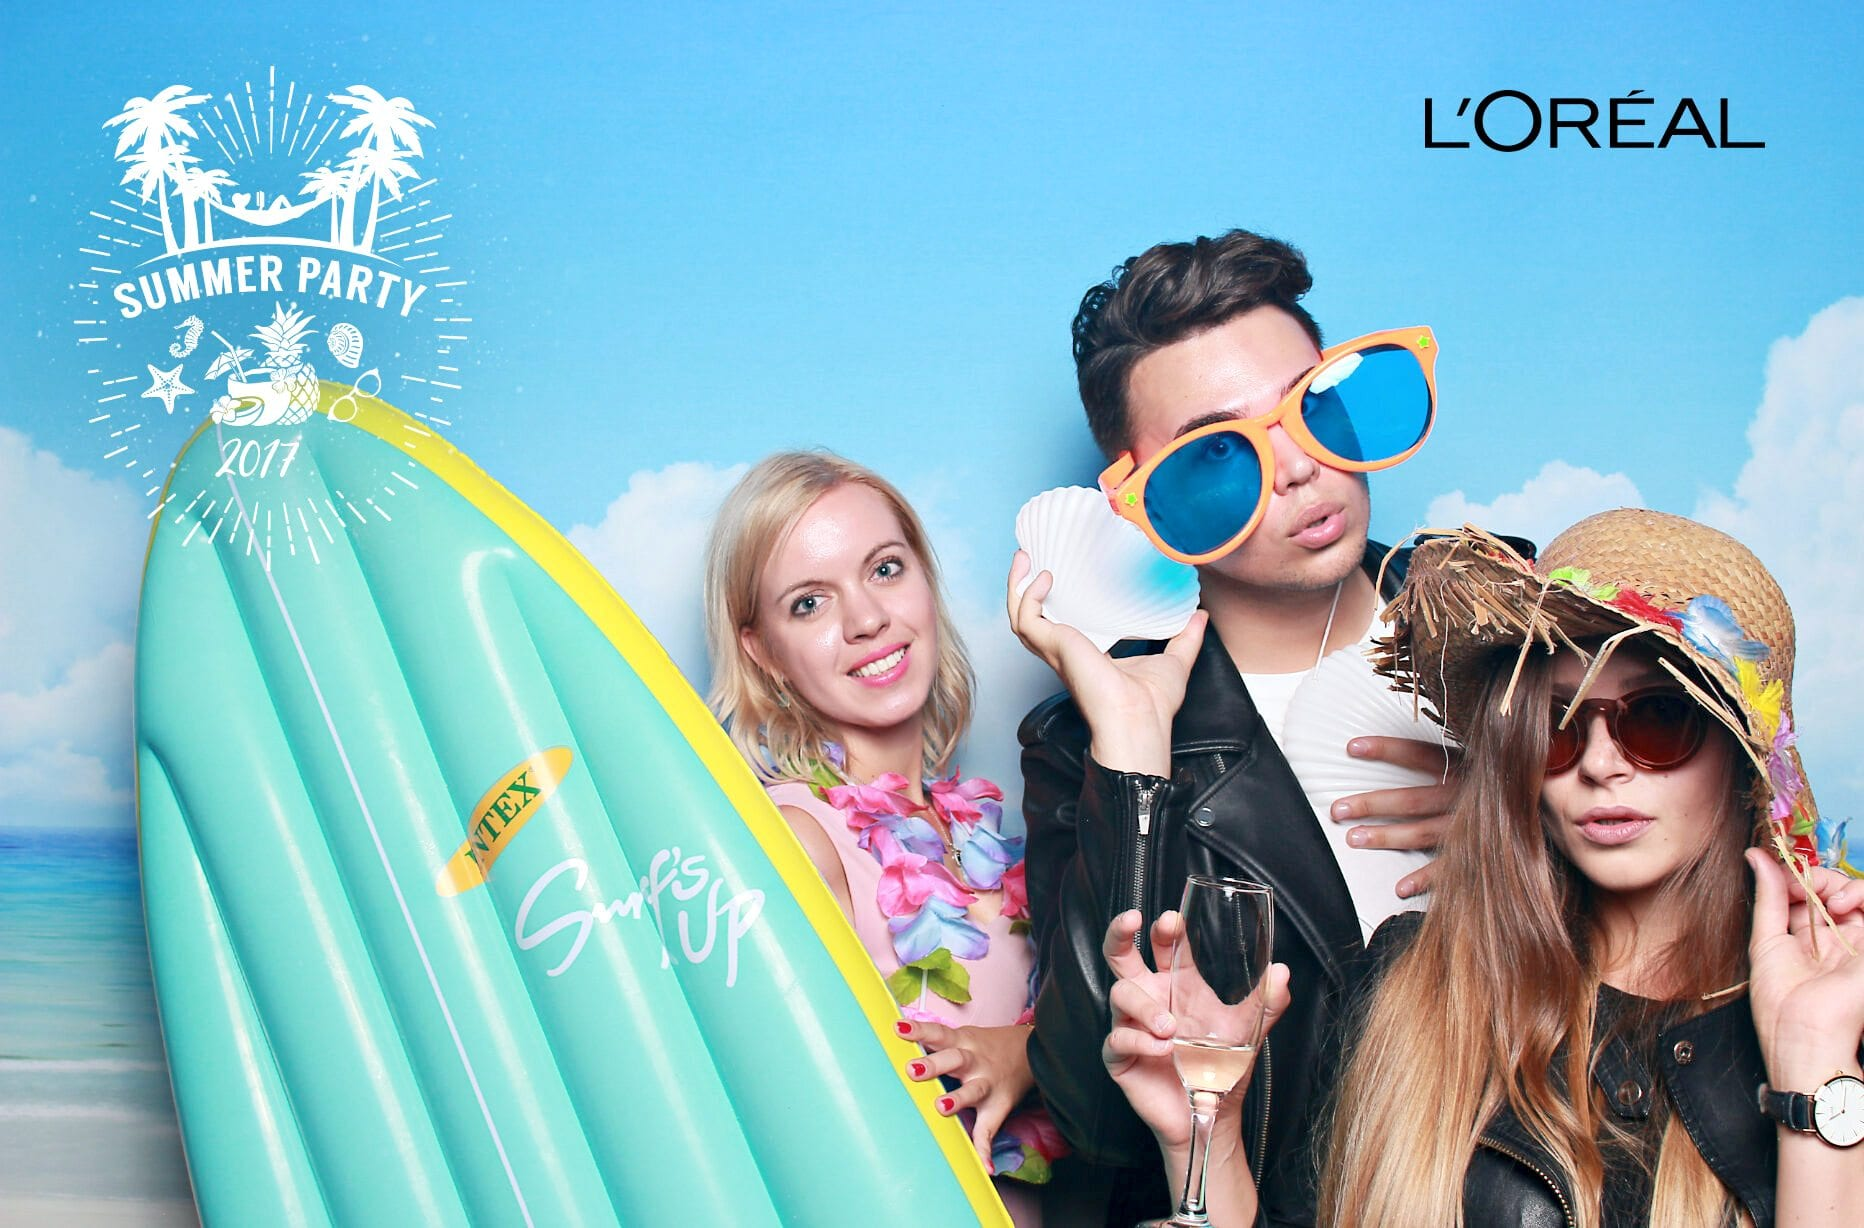 fotokoutek-loreal-summer-party-29-6-2017-275019